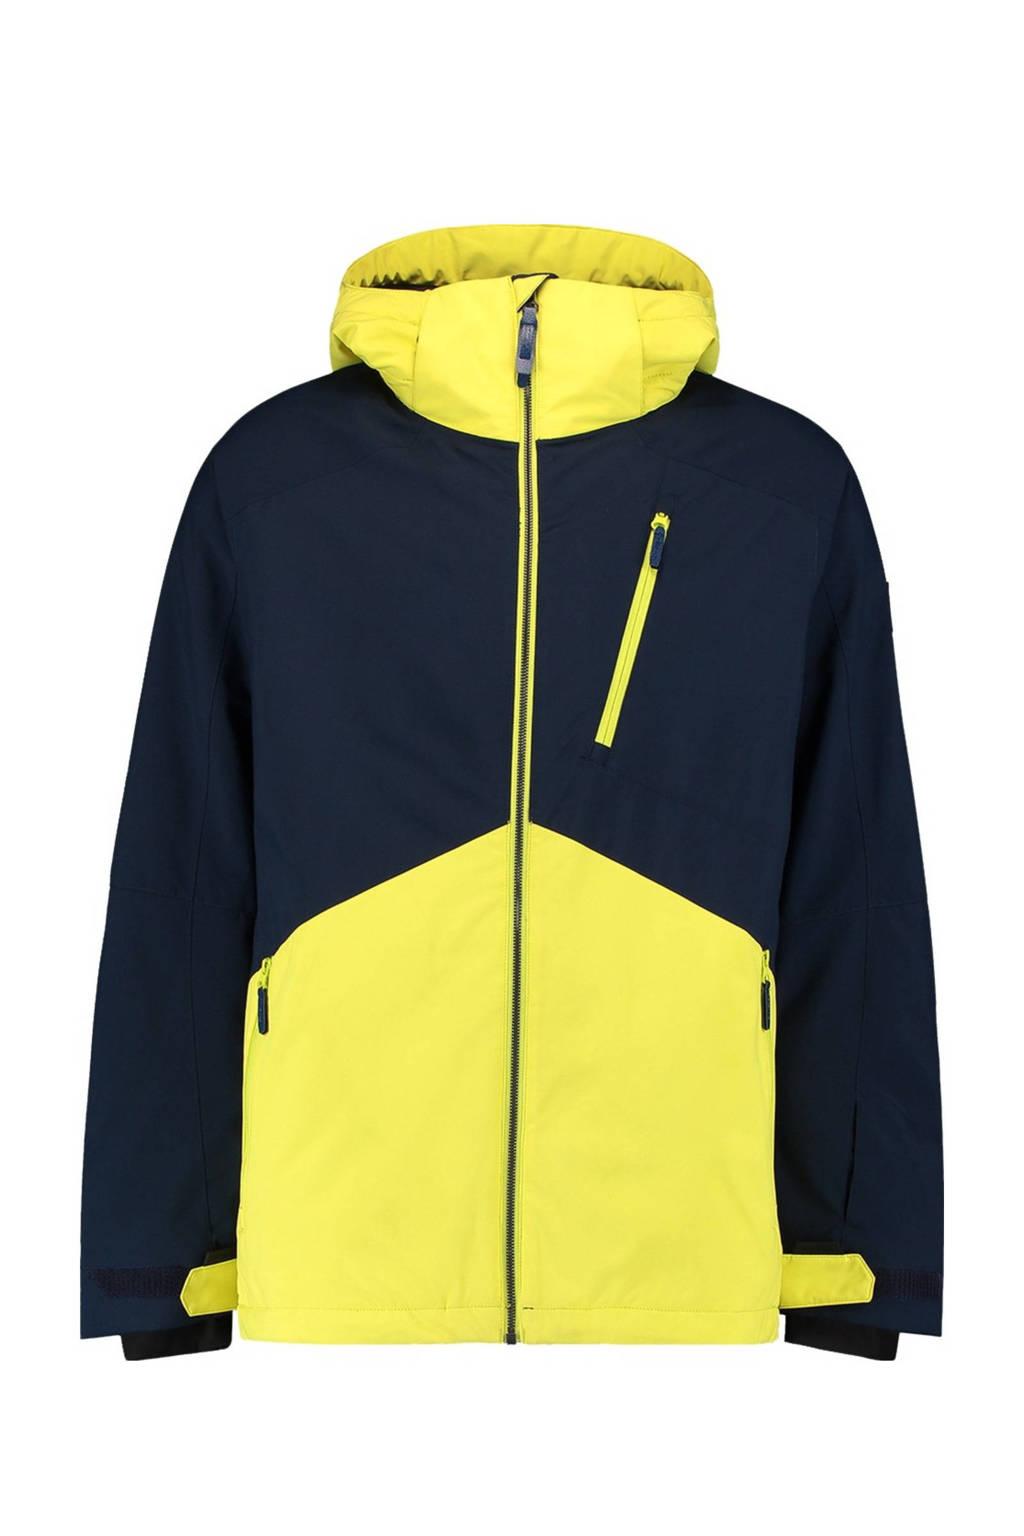 O'Neill jack Aplite donkerblauw/geel, Donkerblauw/geel